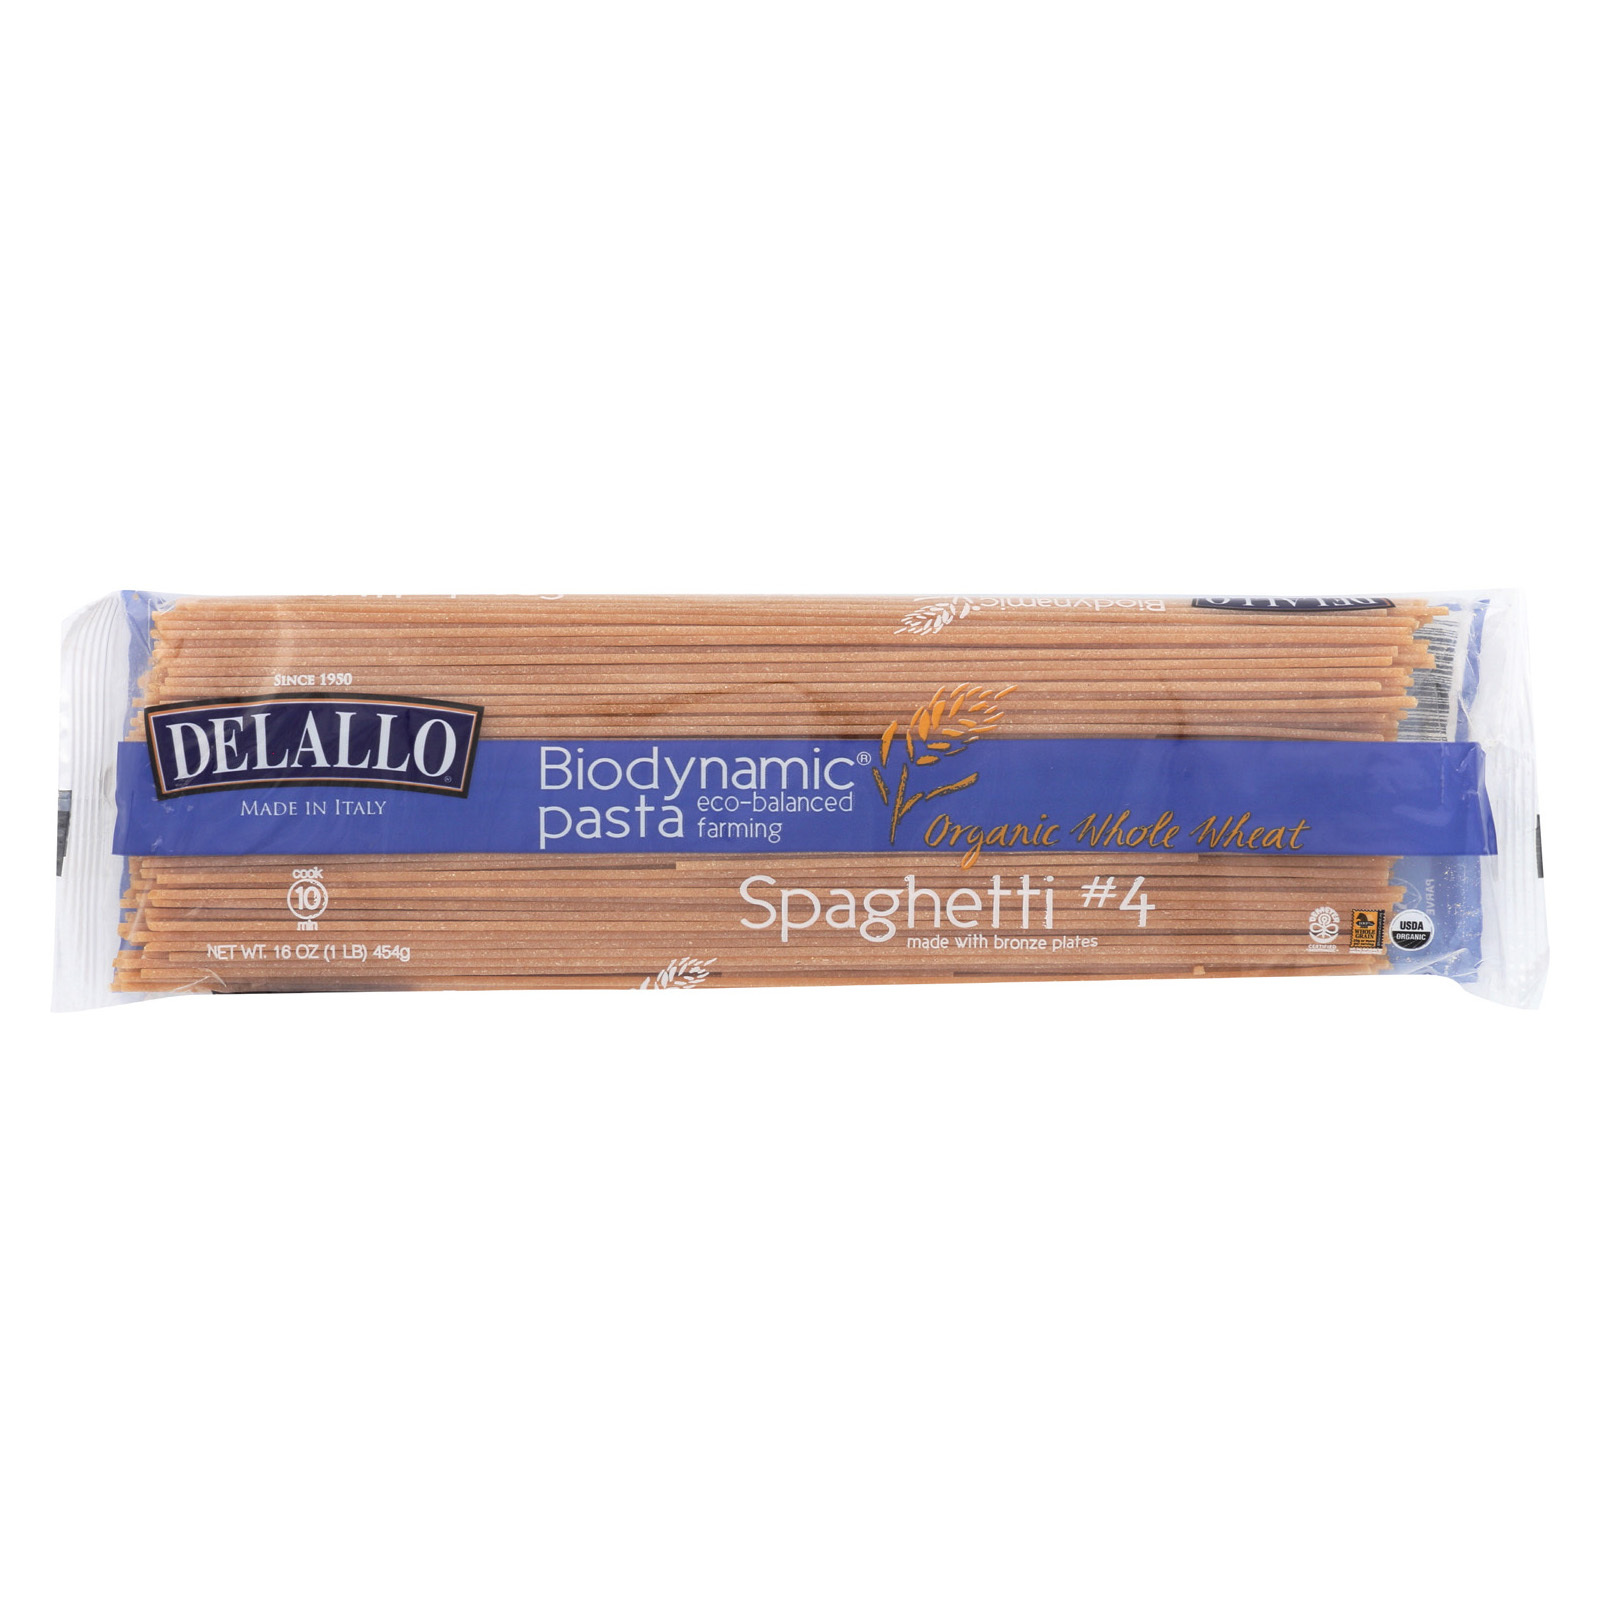 Delallo Biodynamic - Organic - Whole Wheat - Spaghetti - Case of 16 - 16 oz